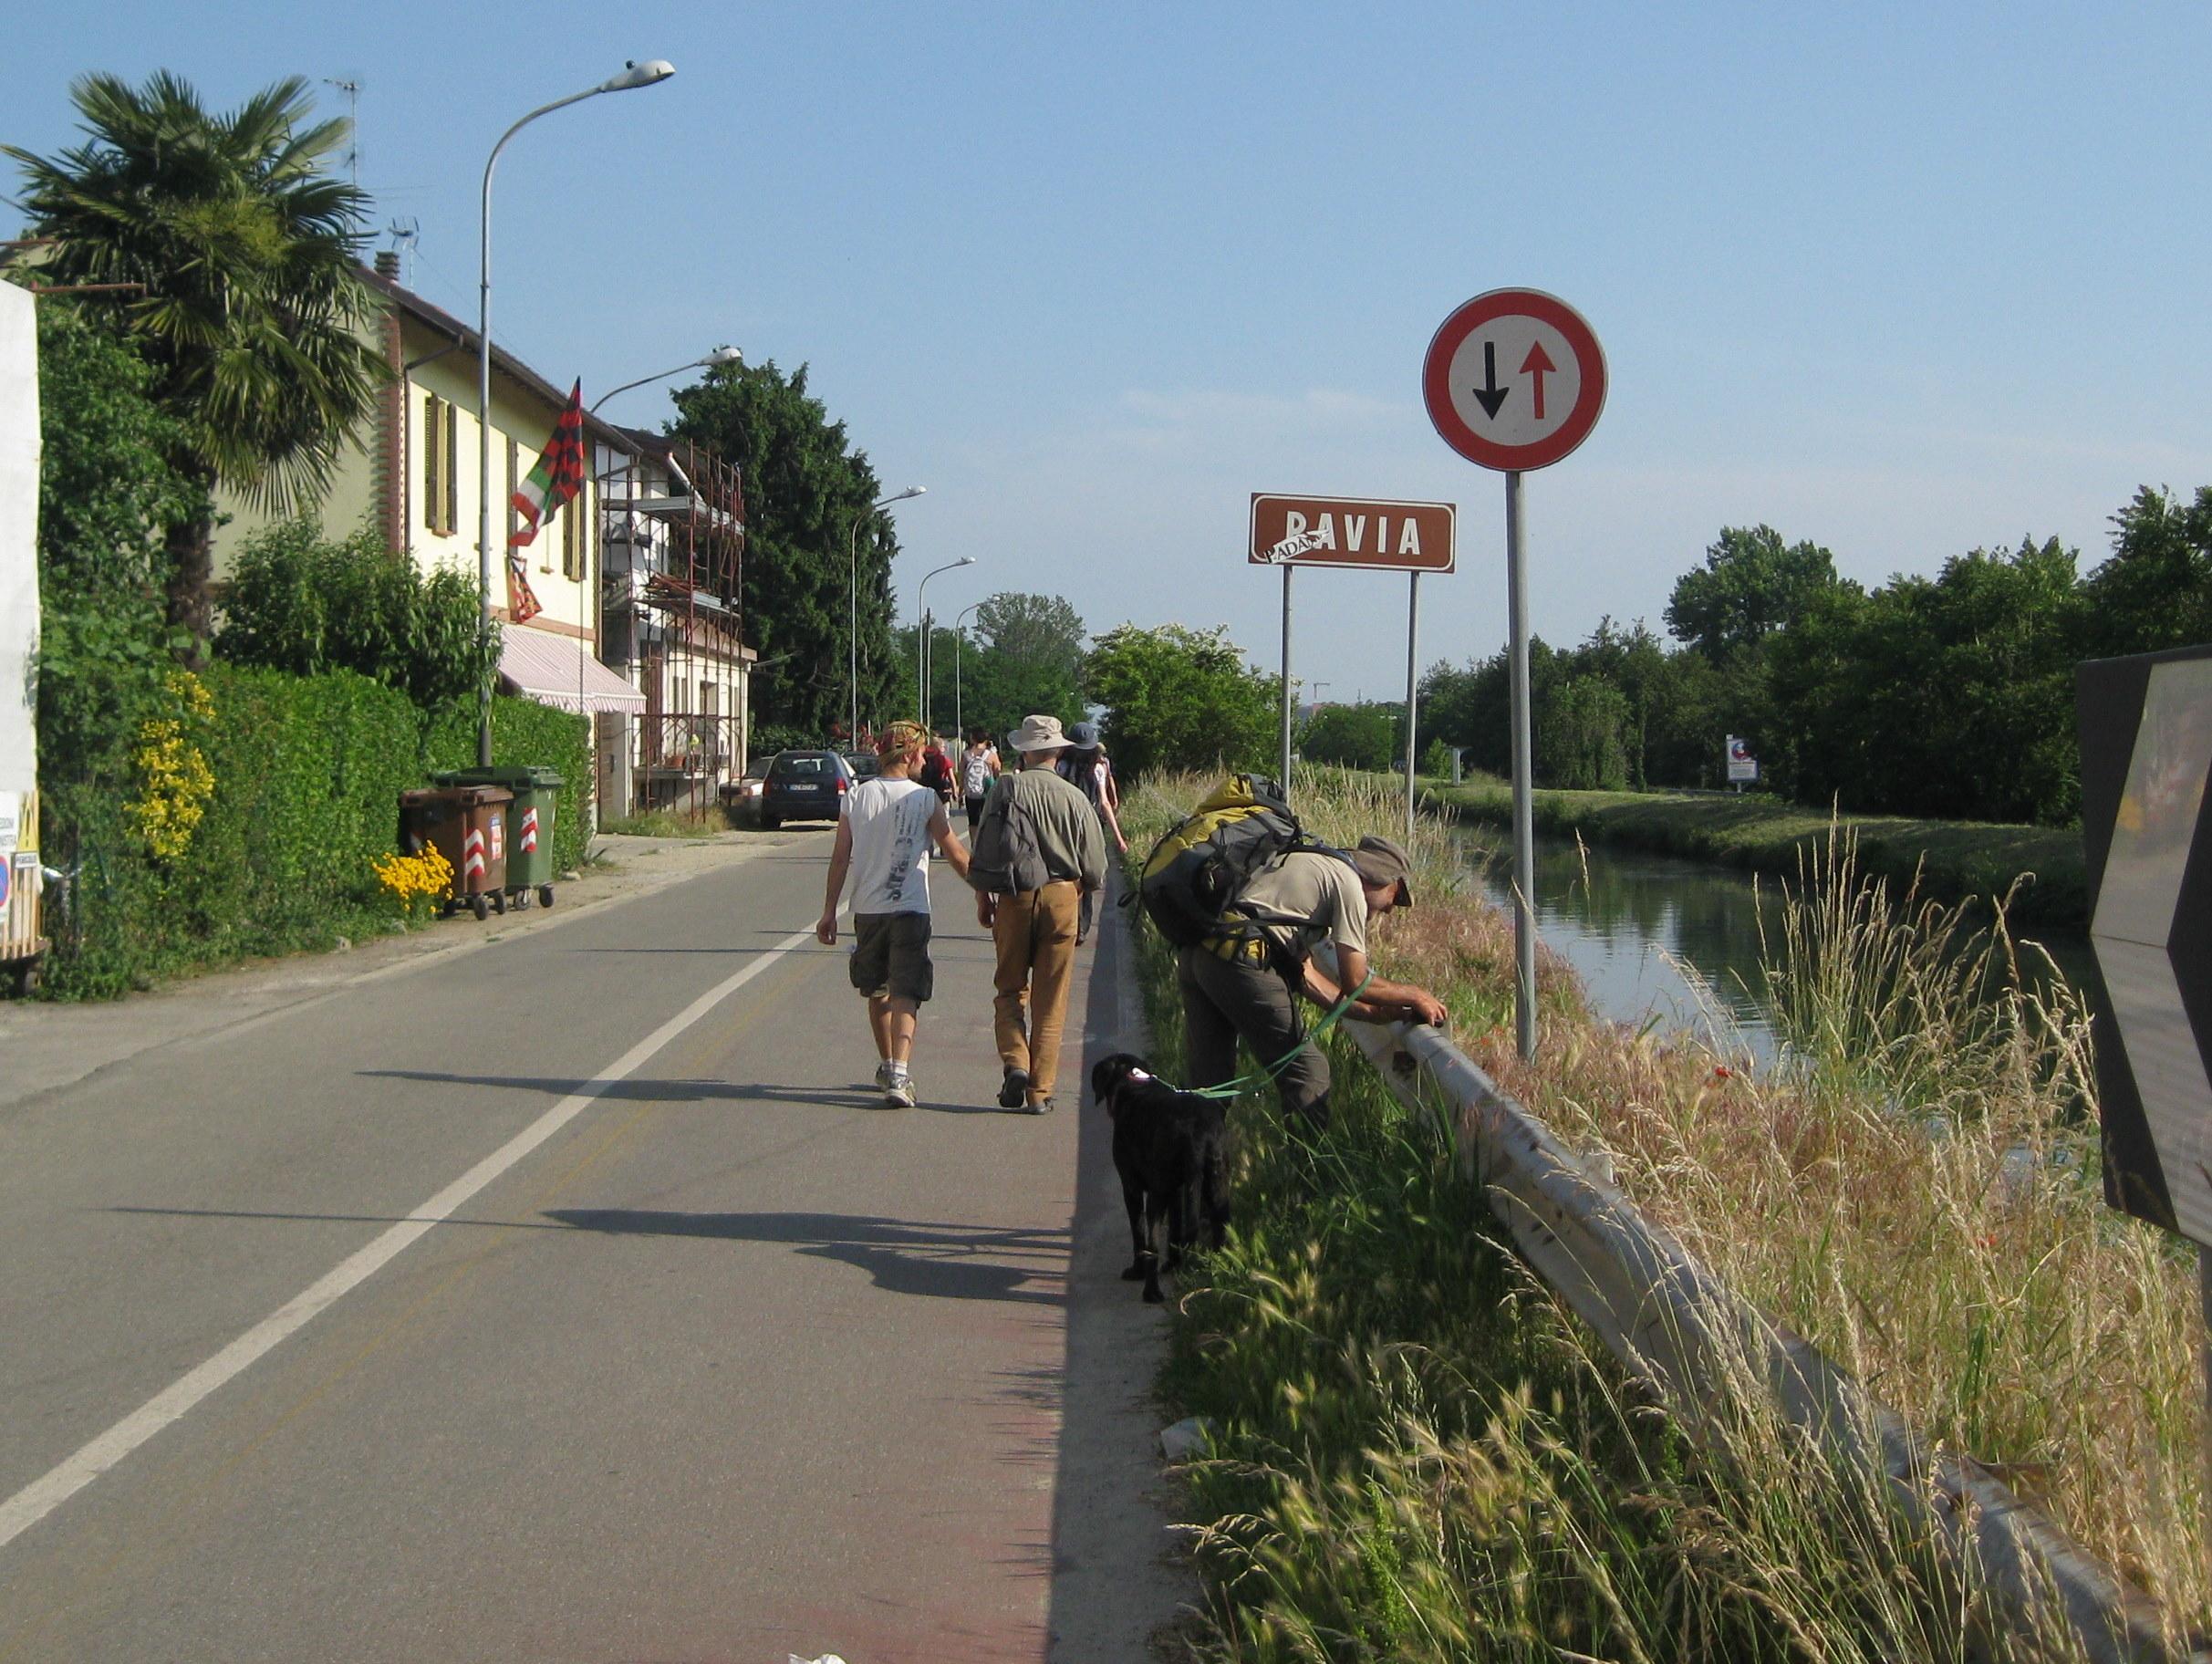 L'arrivo a Pavia